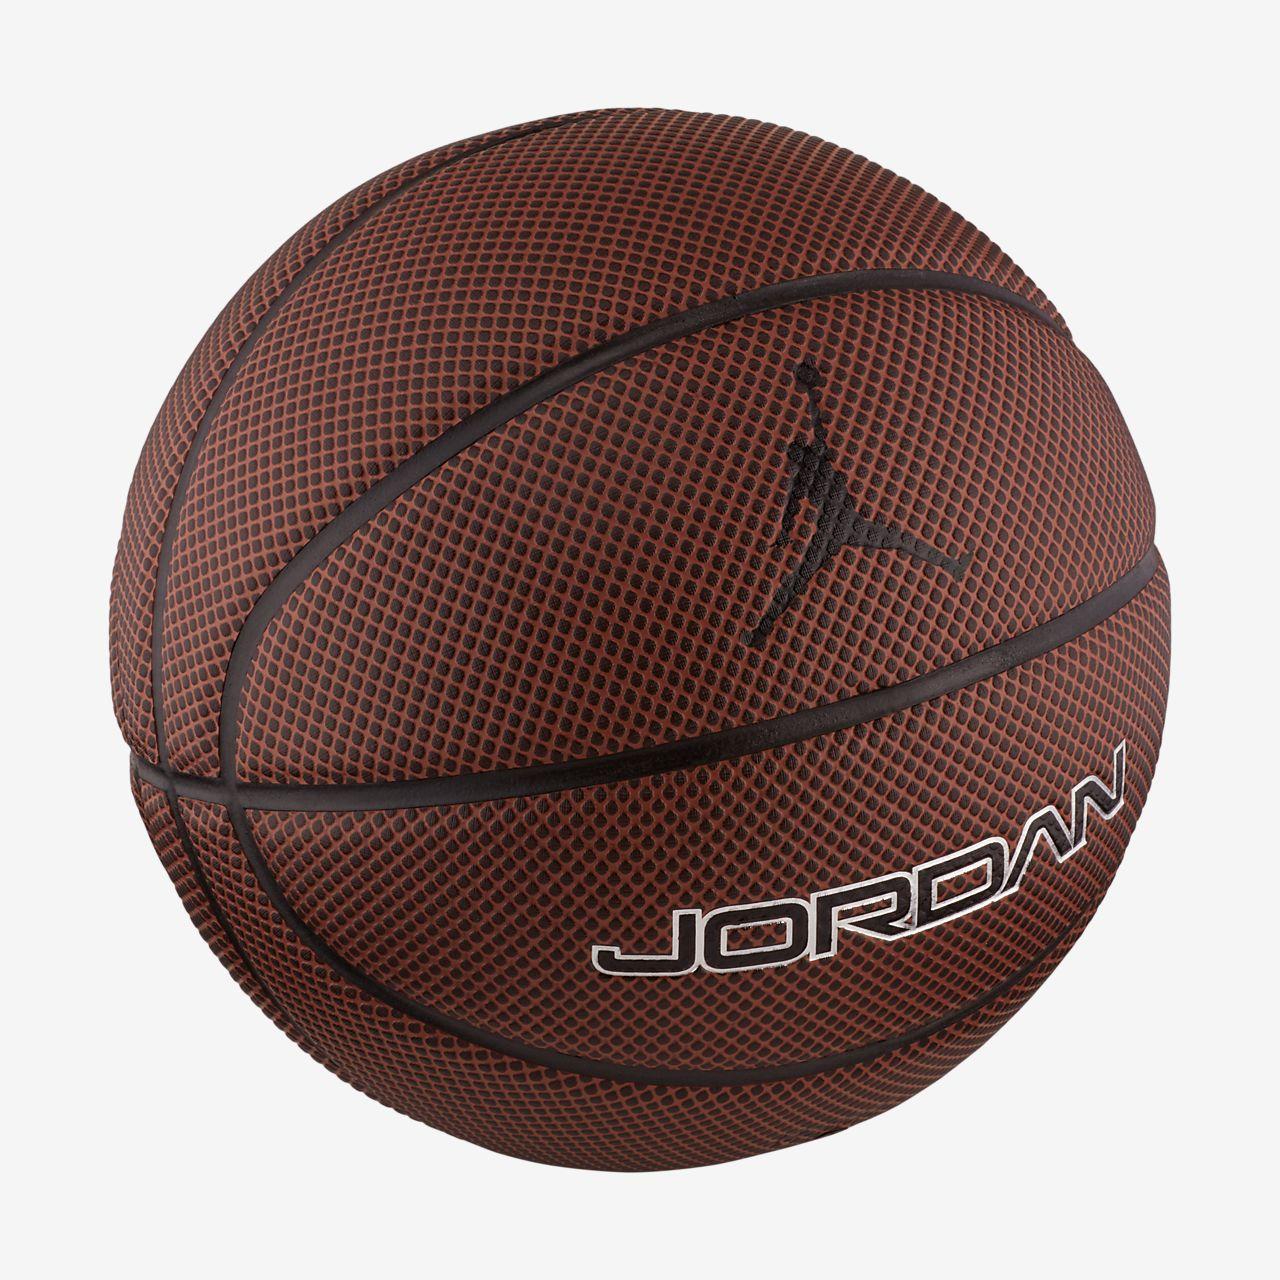 meilleure sélection c0395 6cfa8 Jordan Legacy 8P (Size 7) Basketball